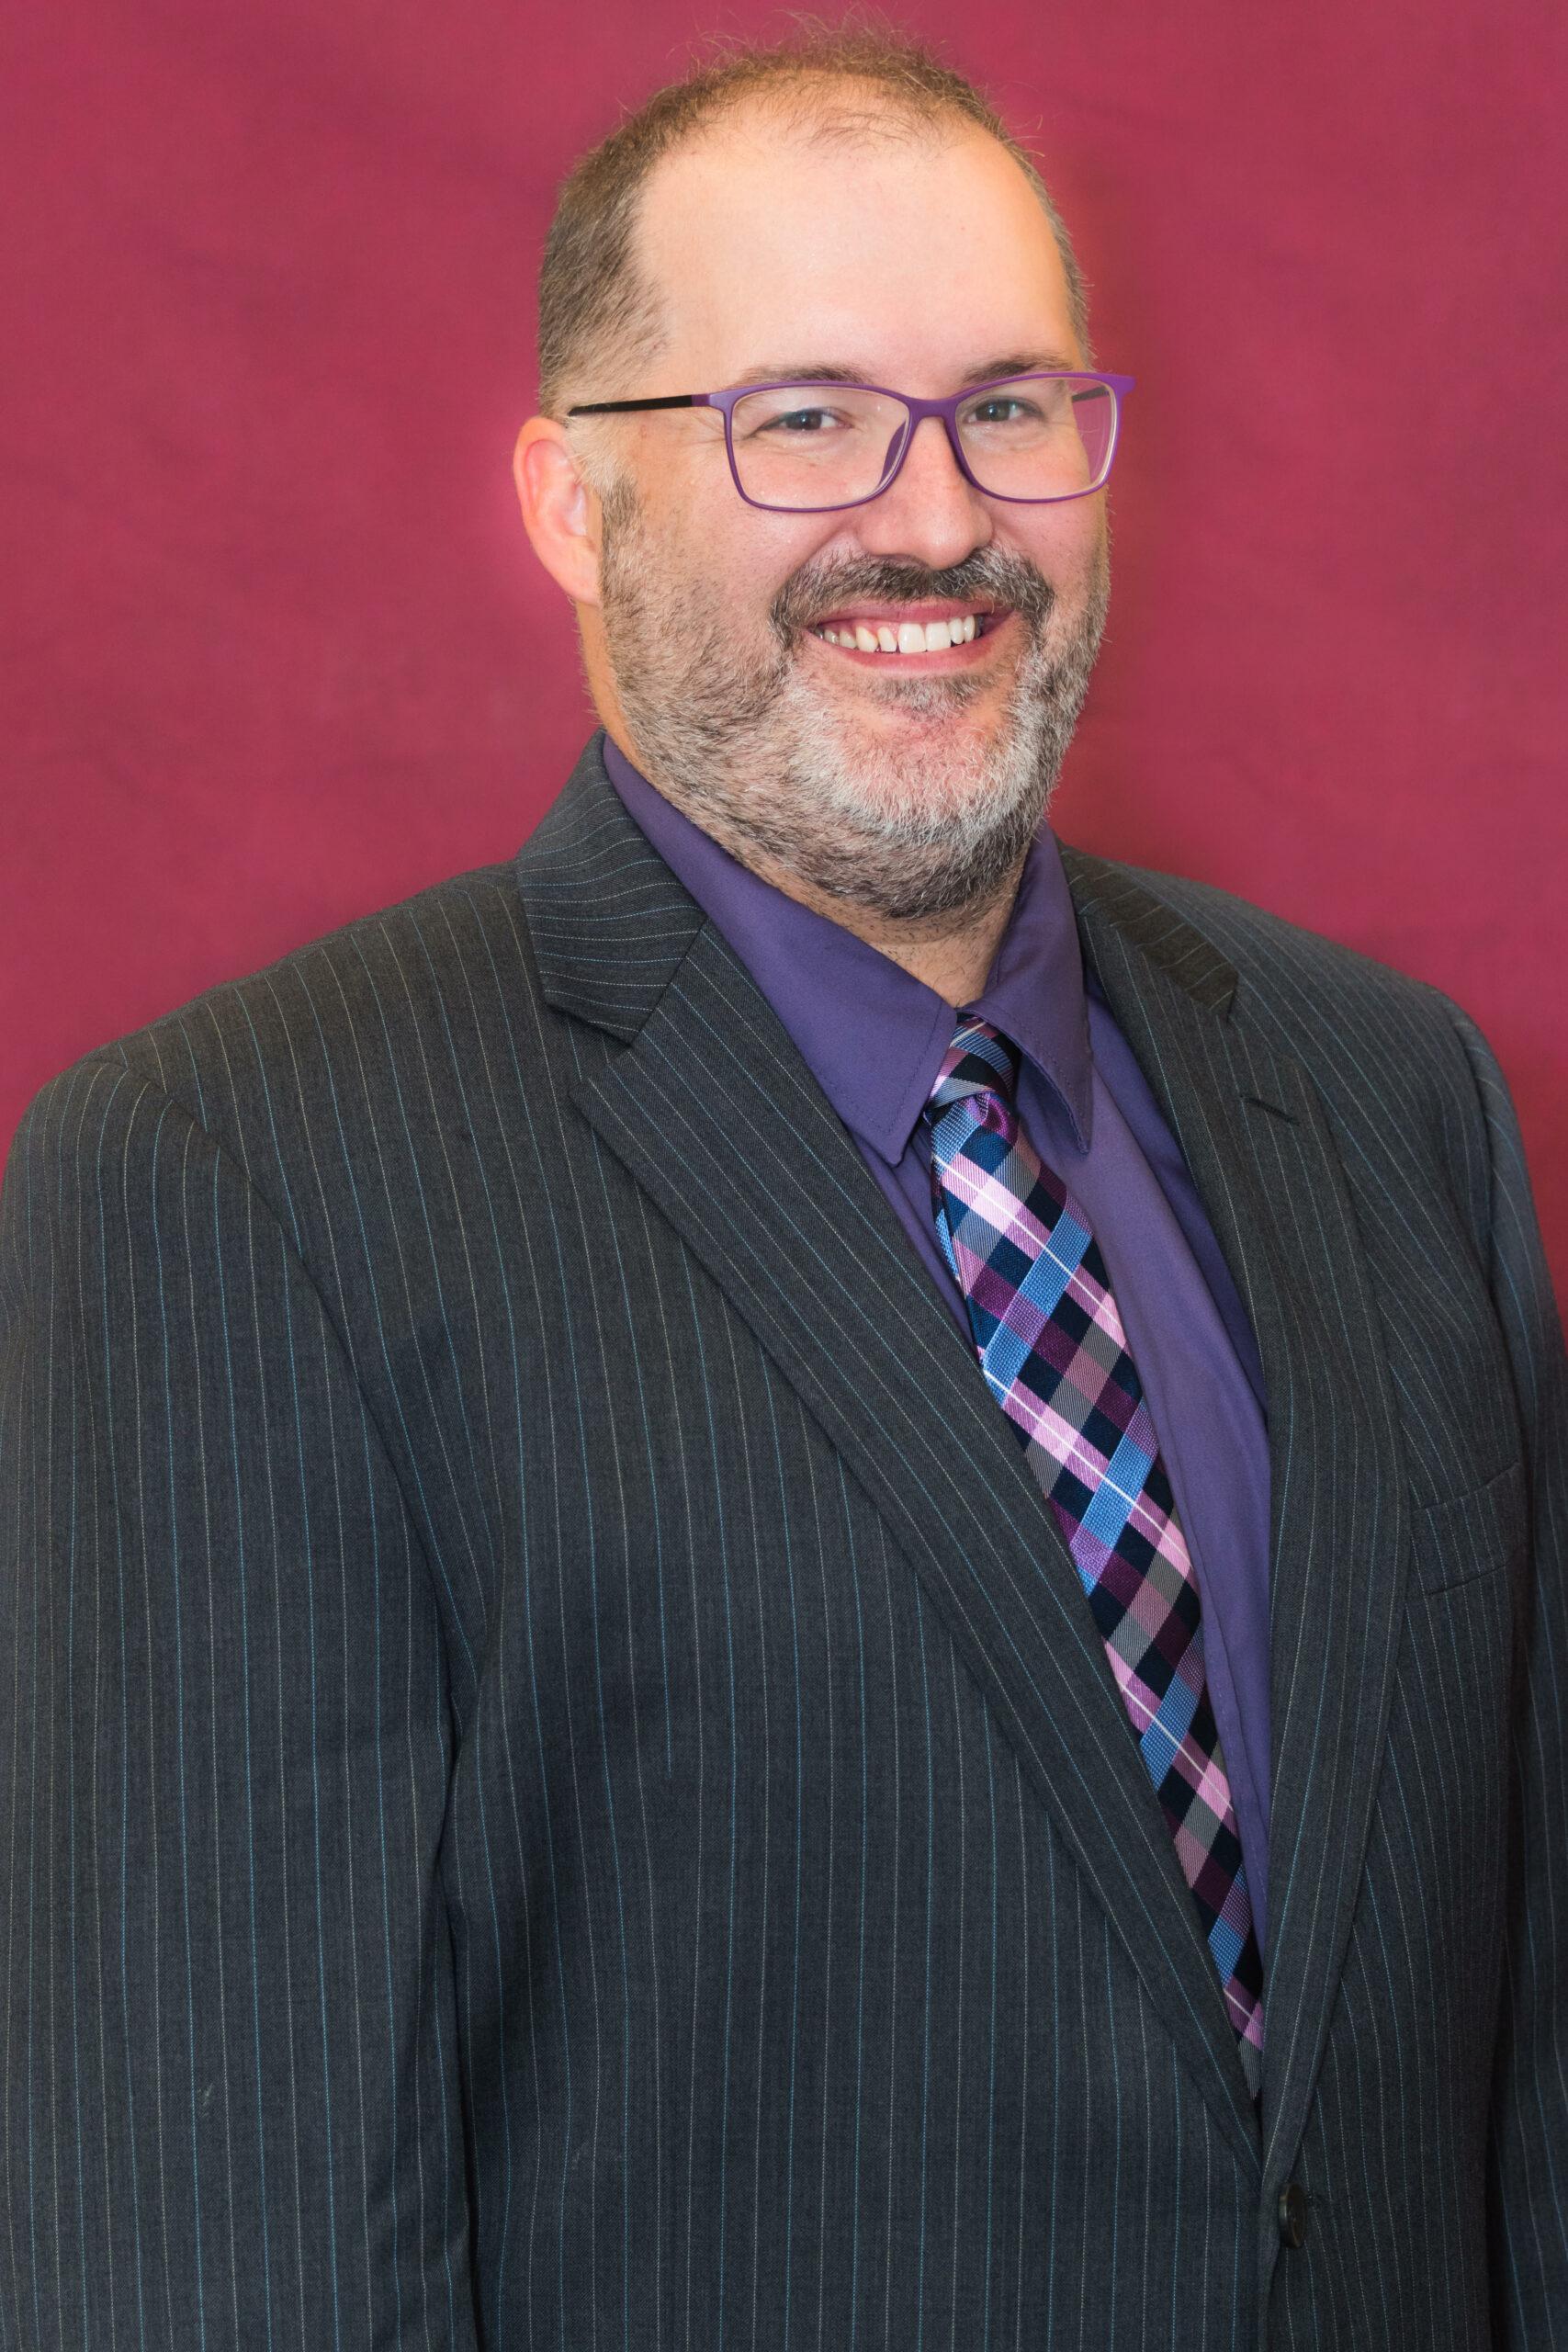 Dr. Marcus Crawford